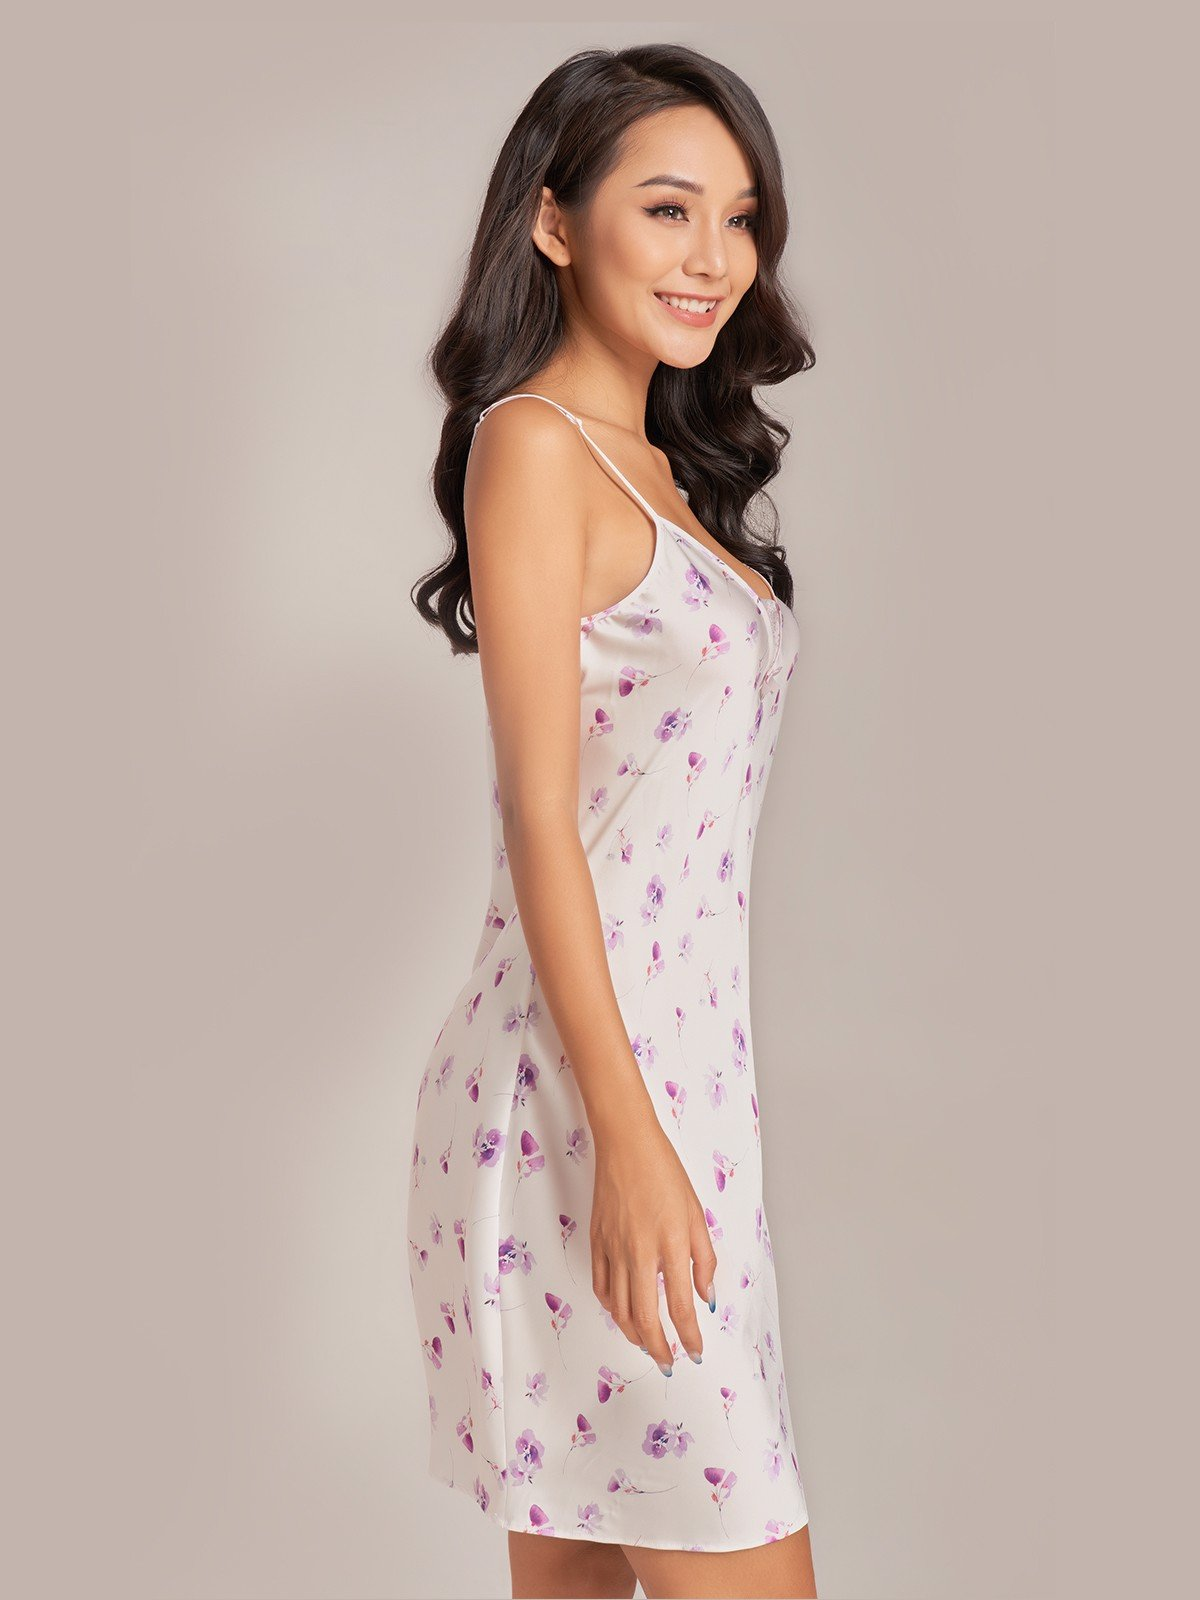 Đầm ngắn VERA satin hai dây Misty Florals - 0145